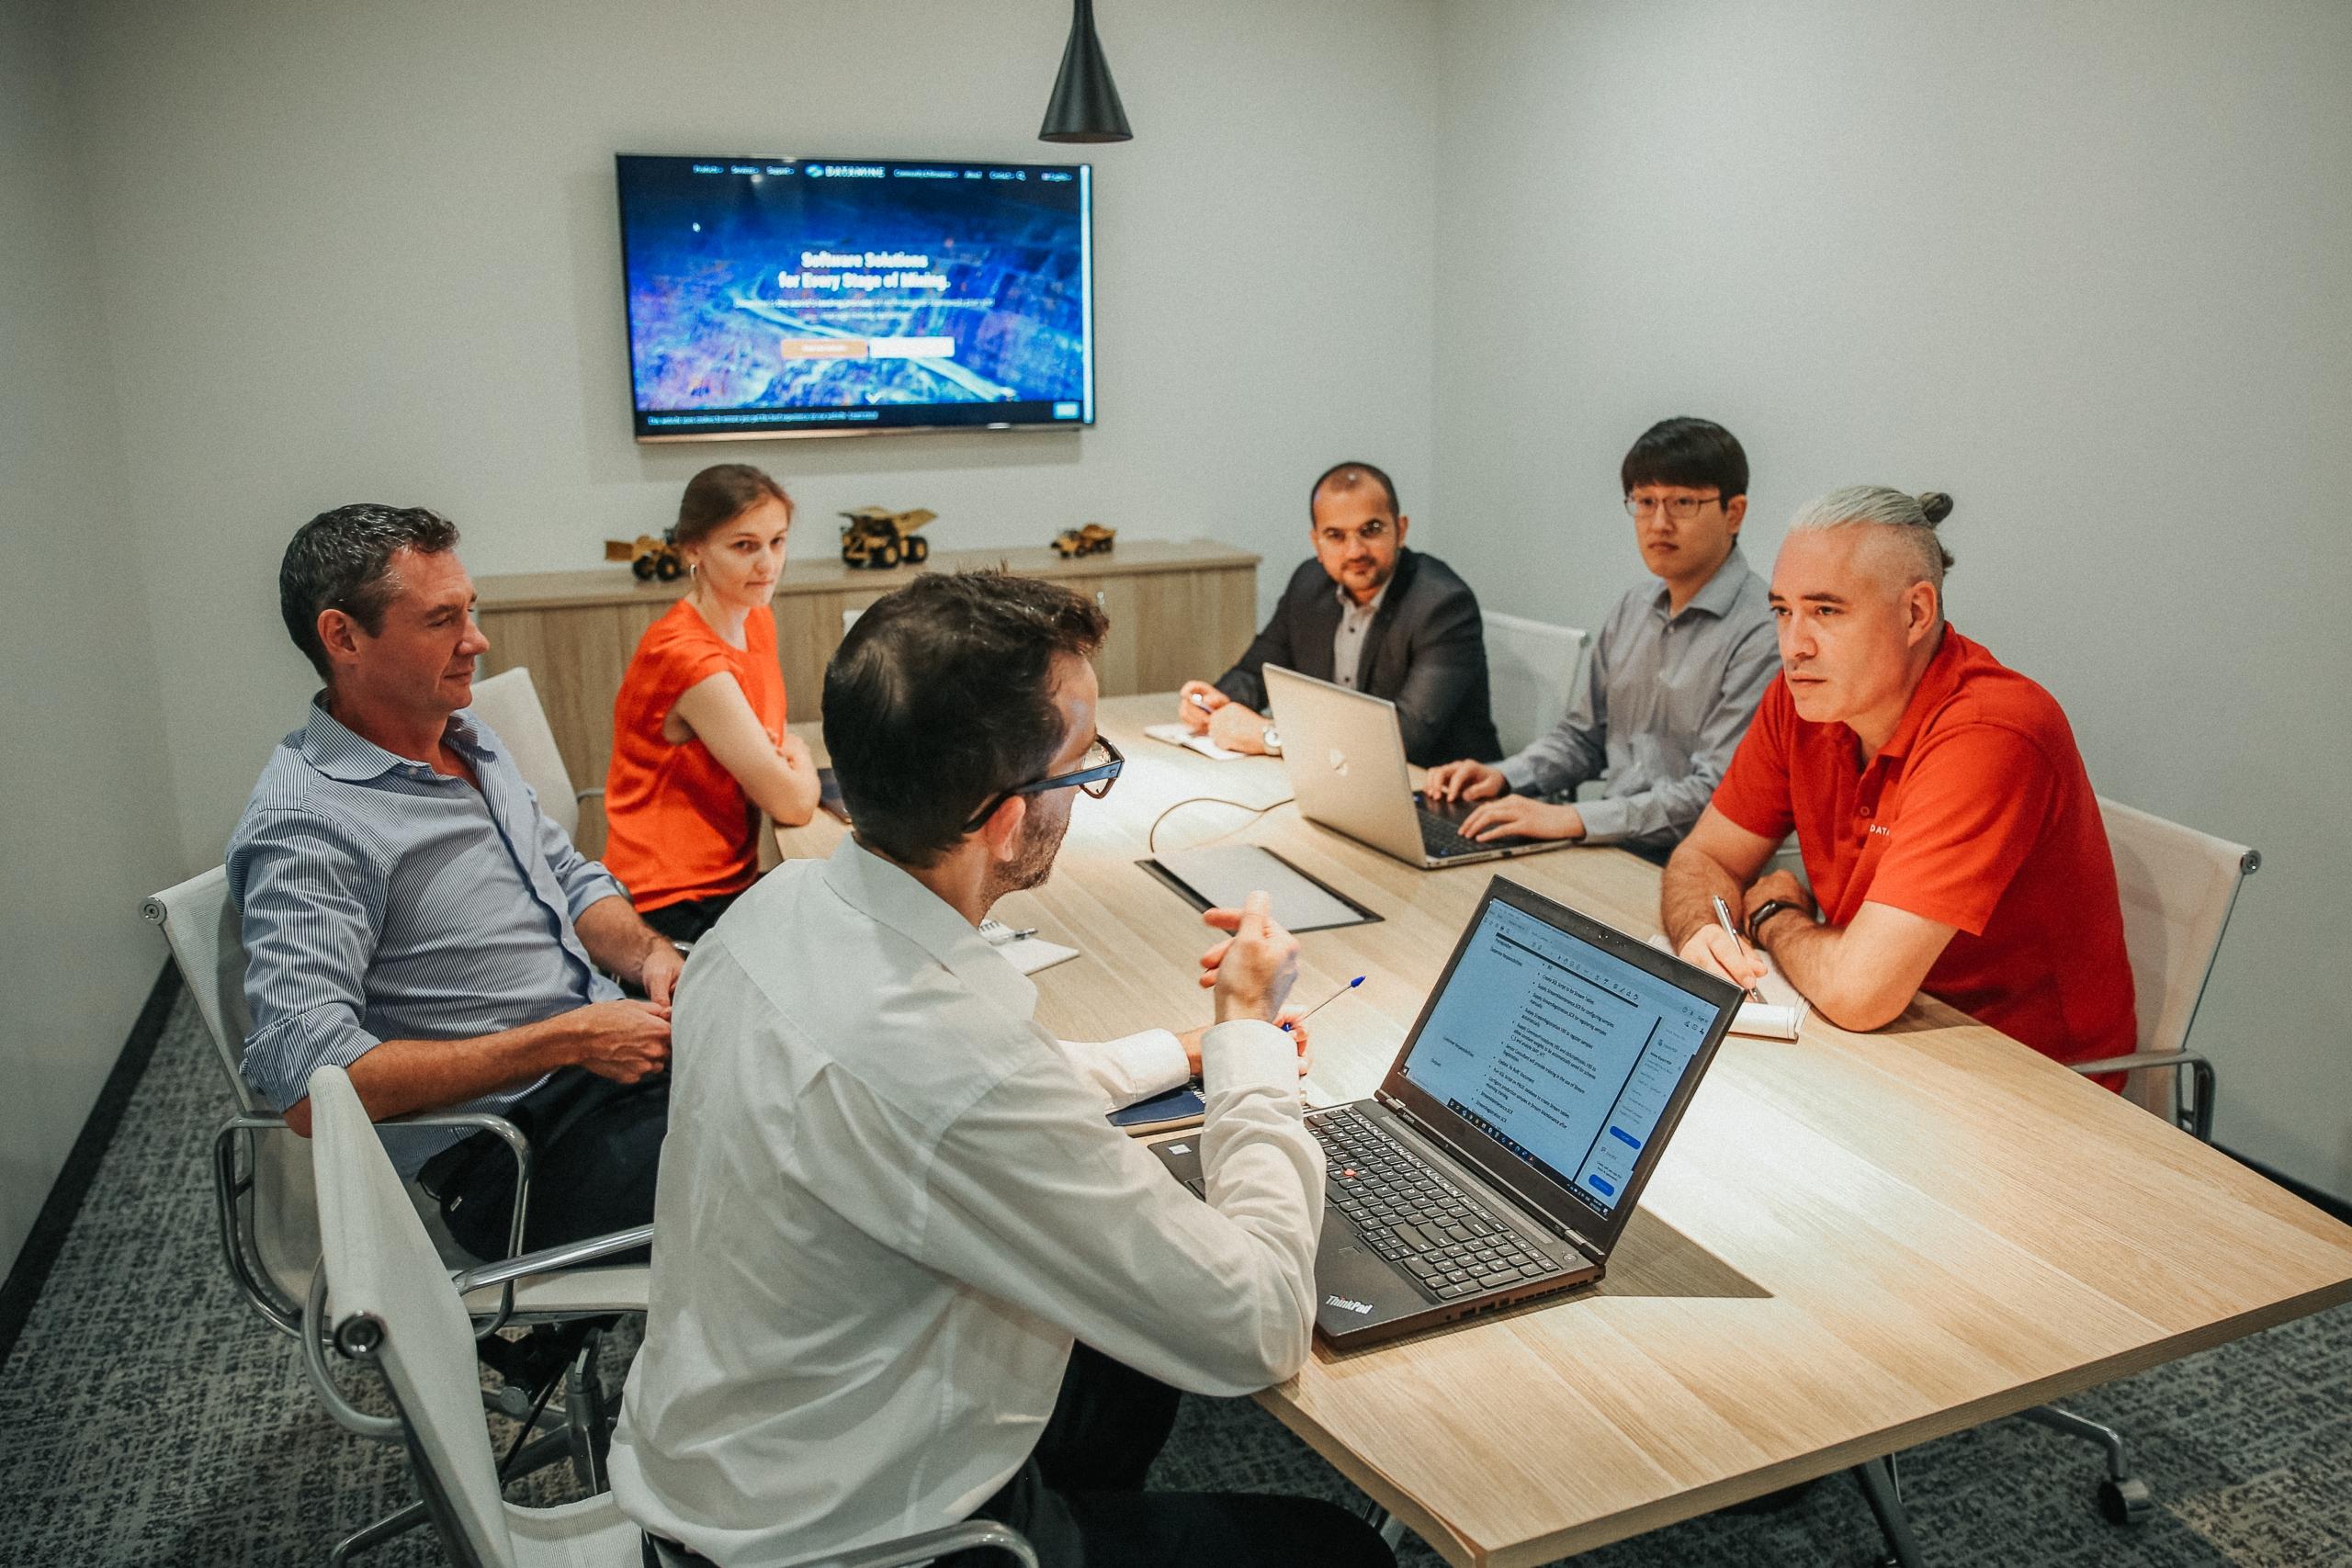 Team meeting at Datamine boardroom